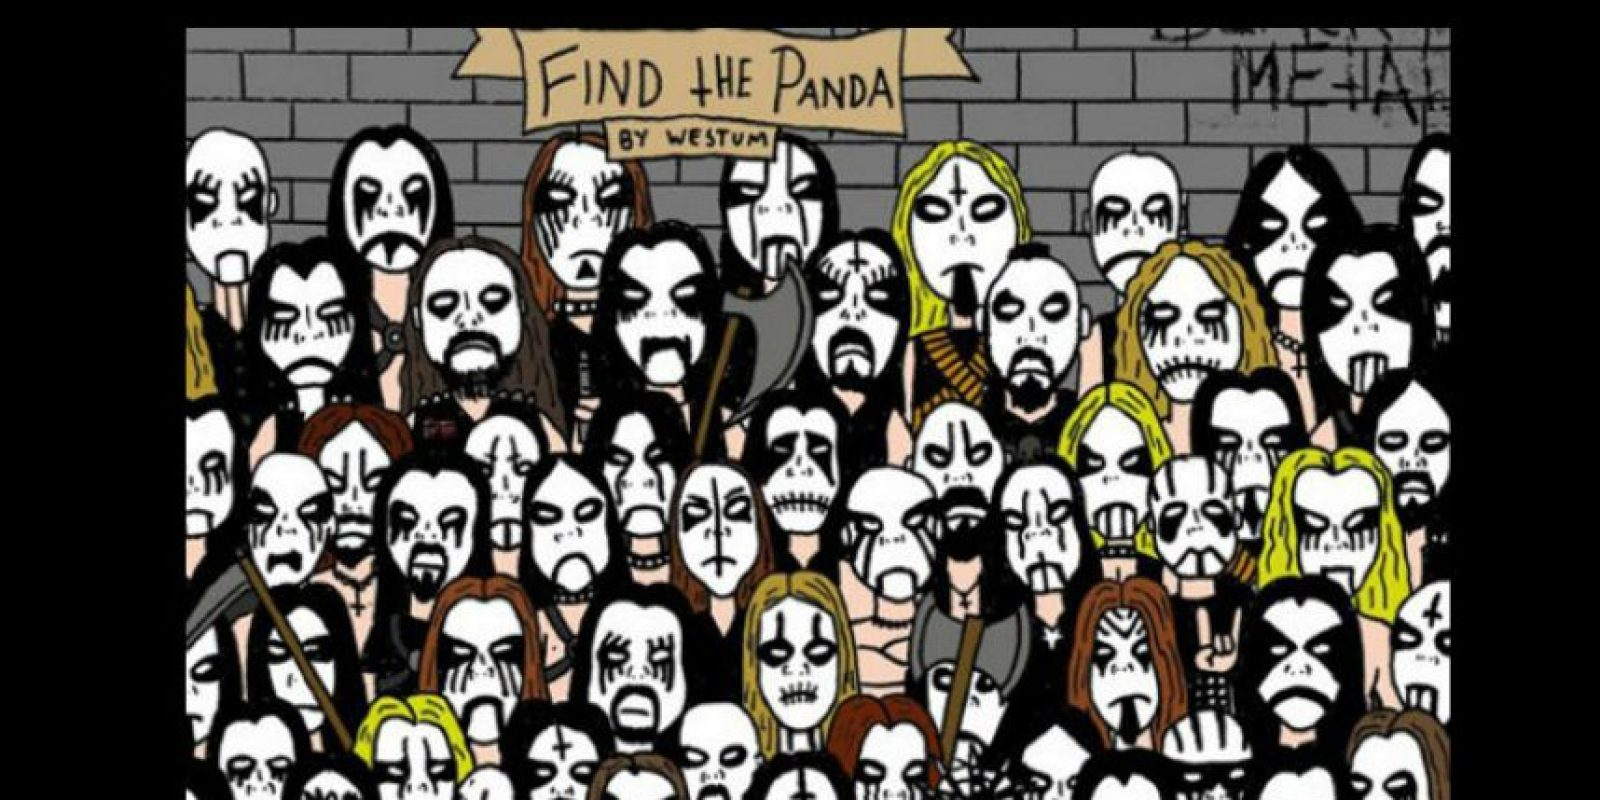 Encuentren al panda Foto:Vía Twitter